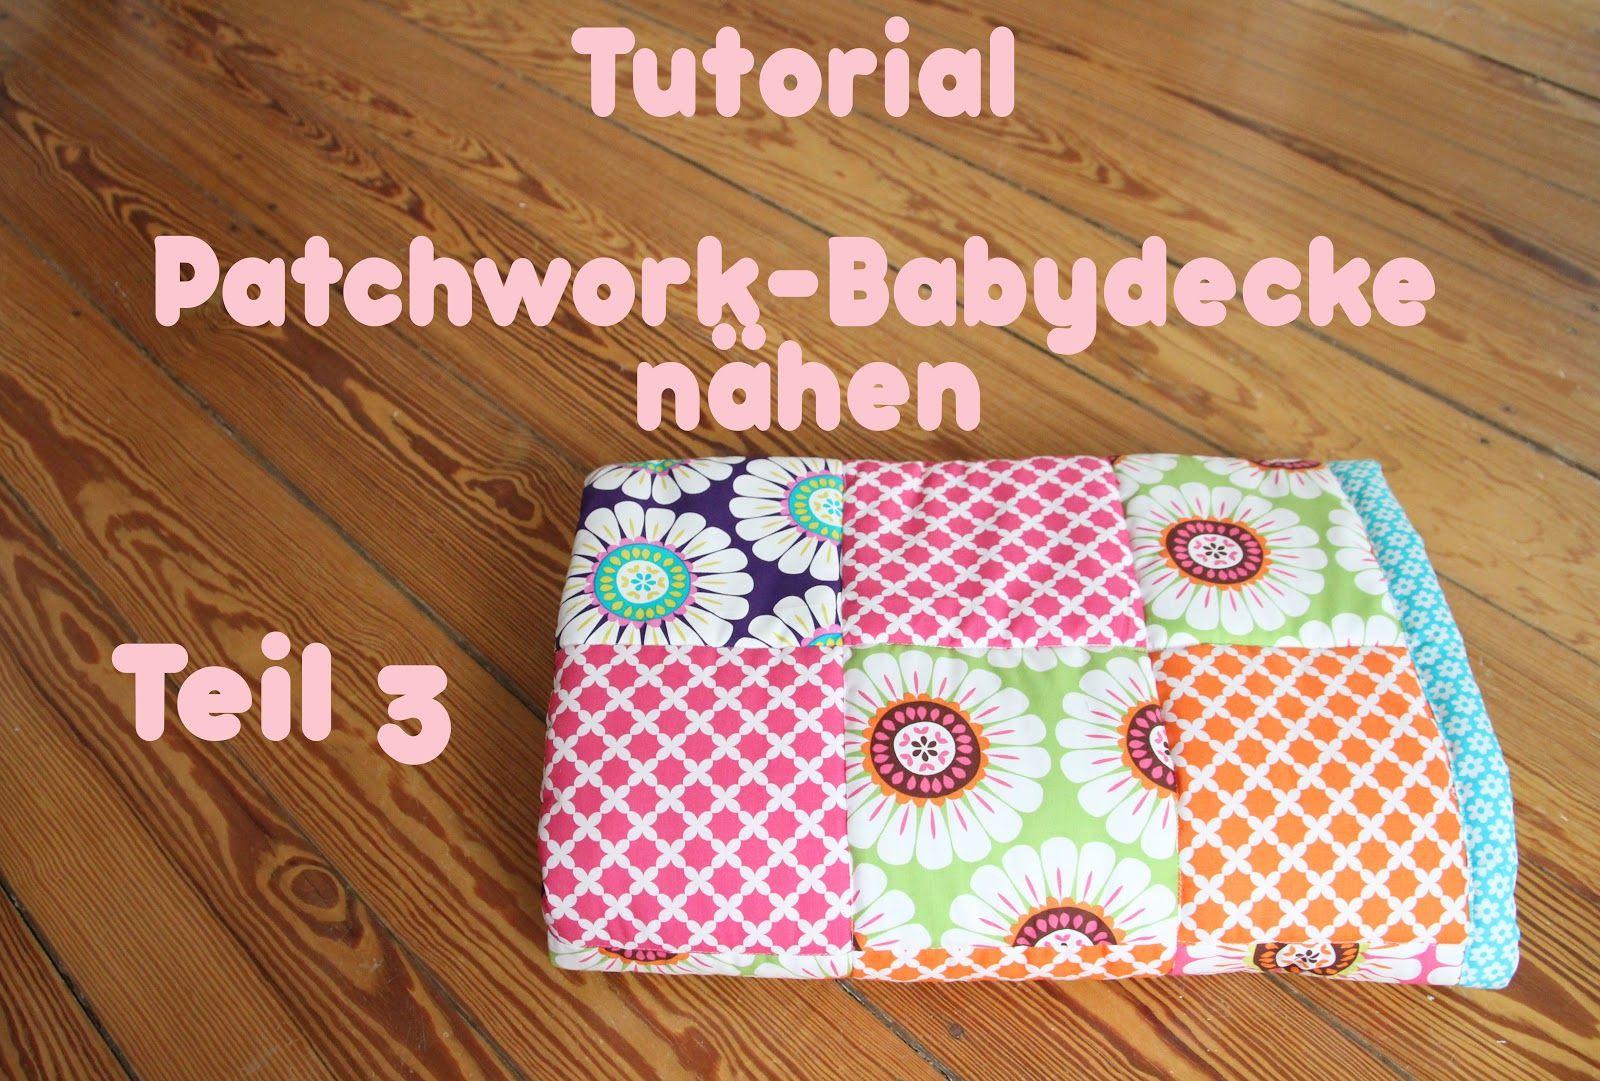 pech tutorial patchworkdecke teil 3 vom patchworken zum quilten baby showers and gifts. Black Bedroom Furniture Sets. Home Design Ideas